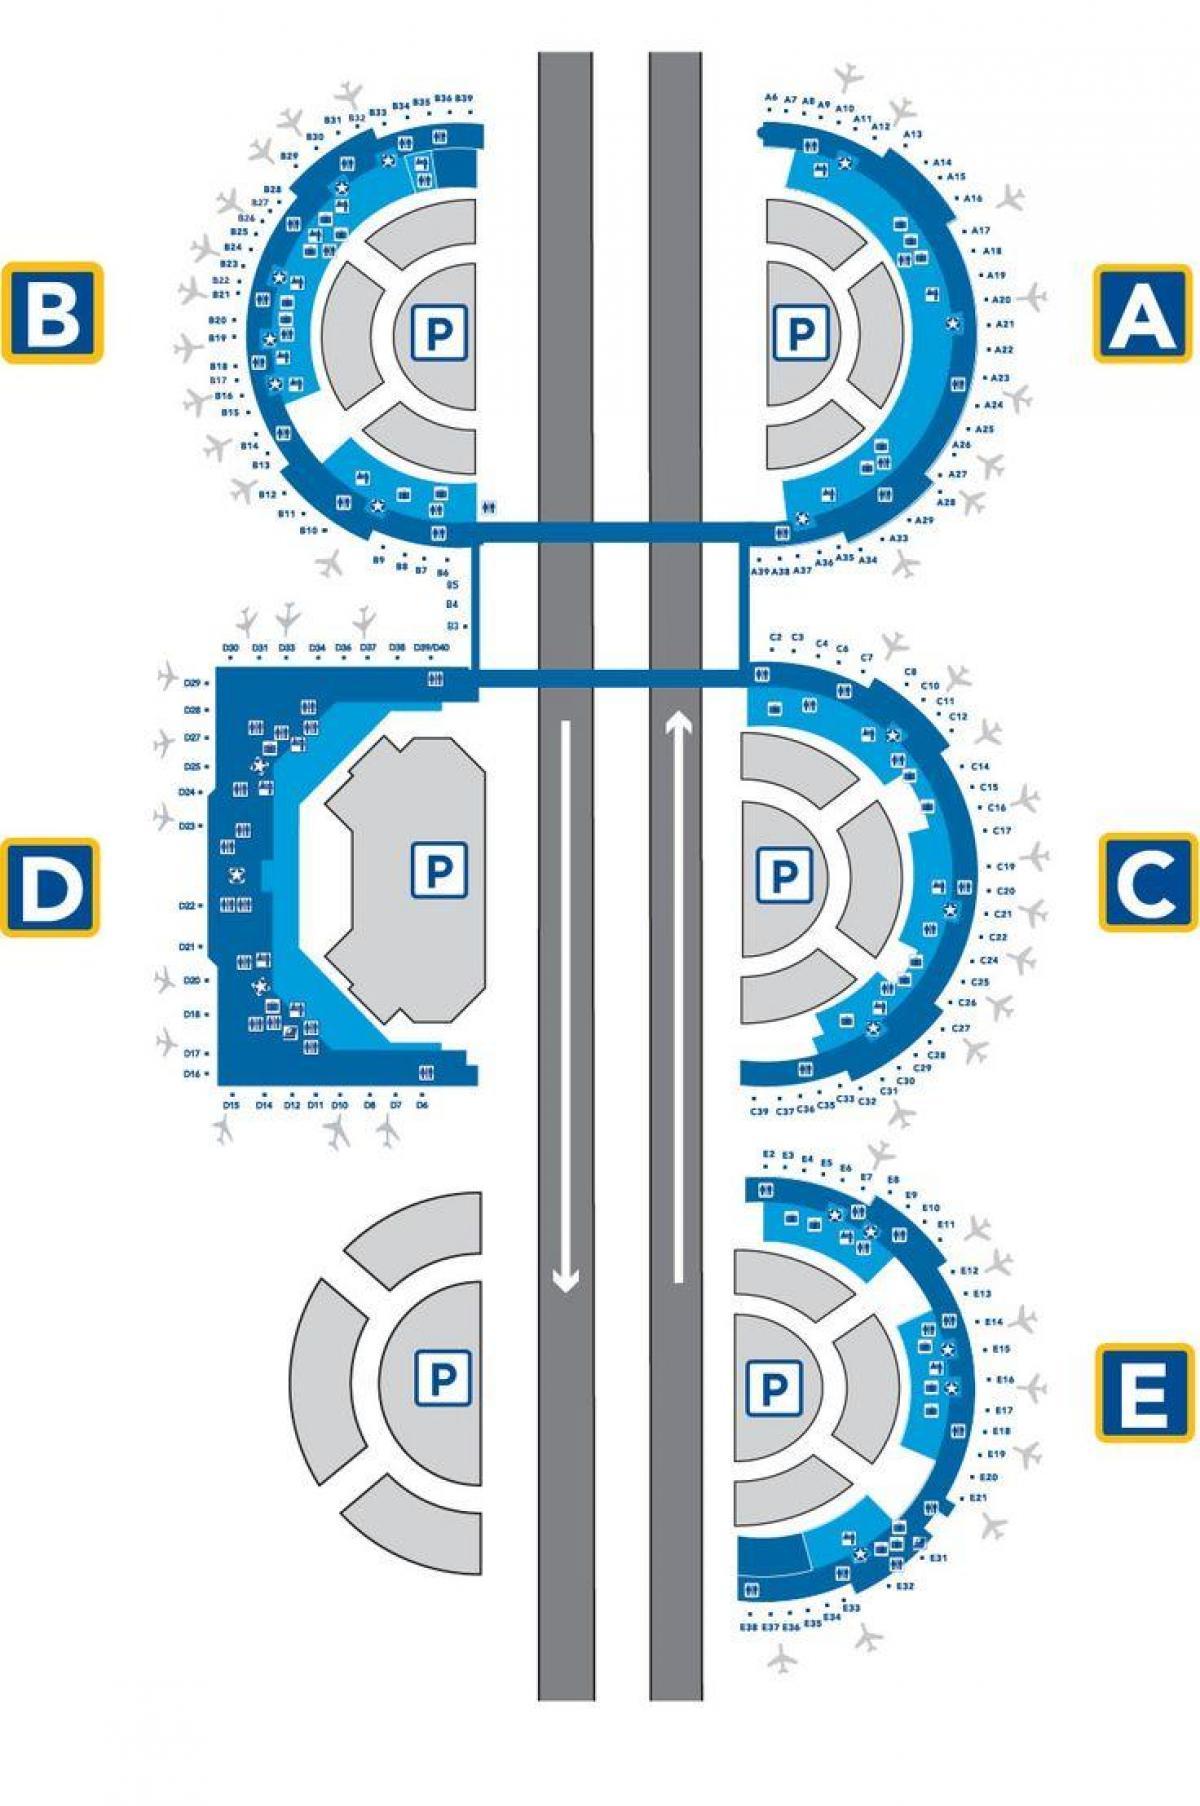 DFW terminal e map - DFW airport terminal e map (Texas - USA) on